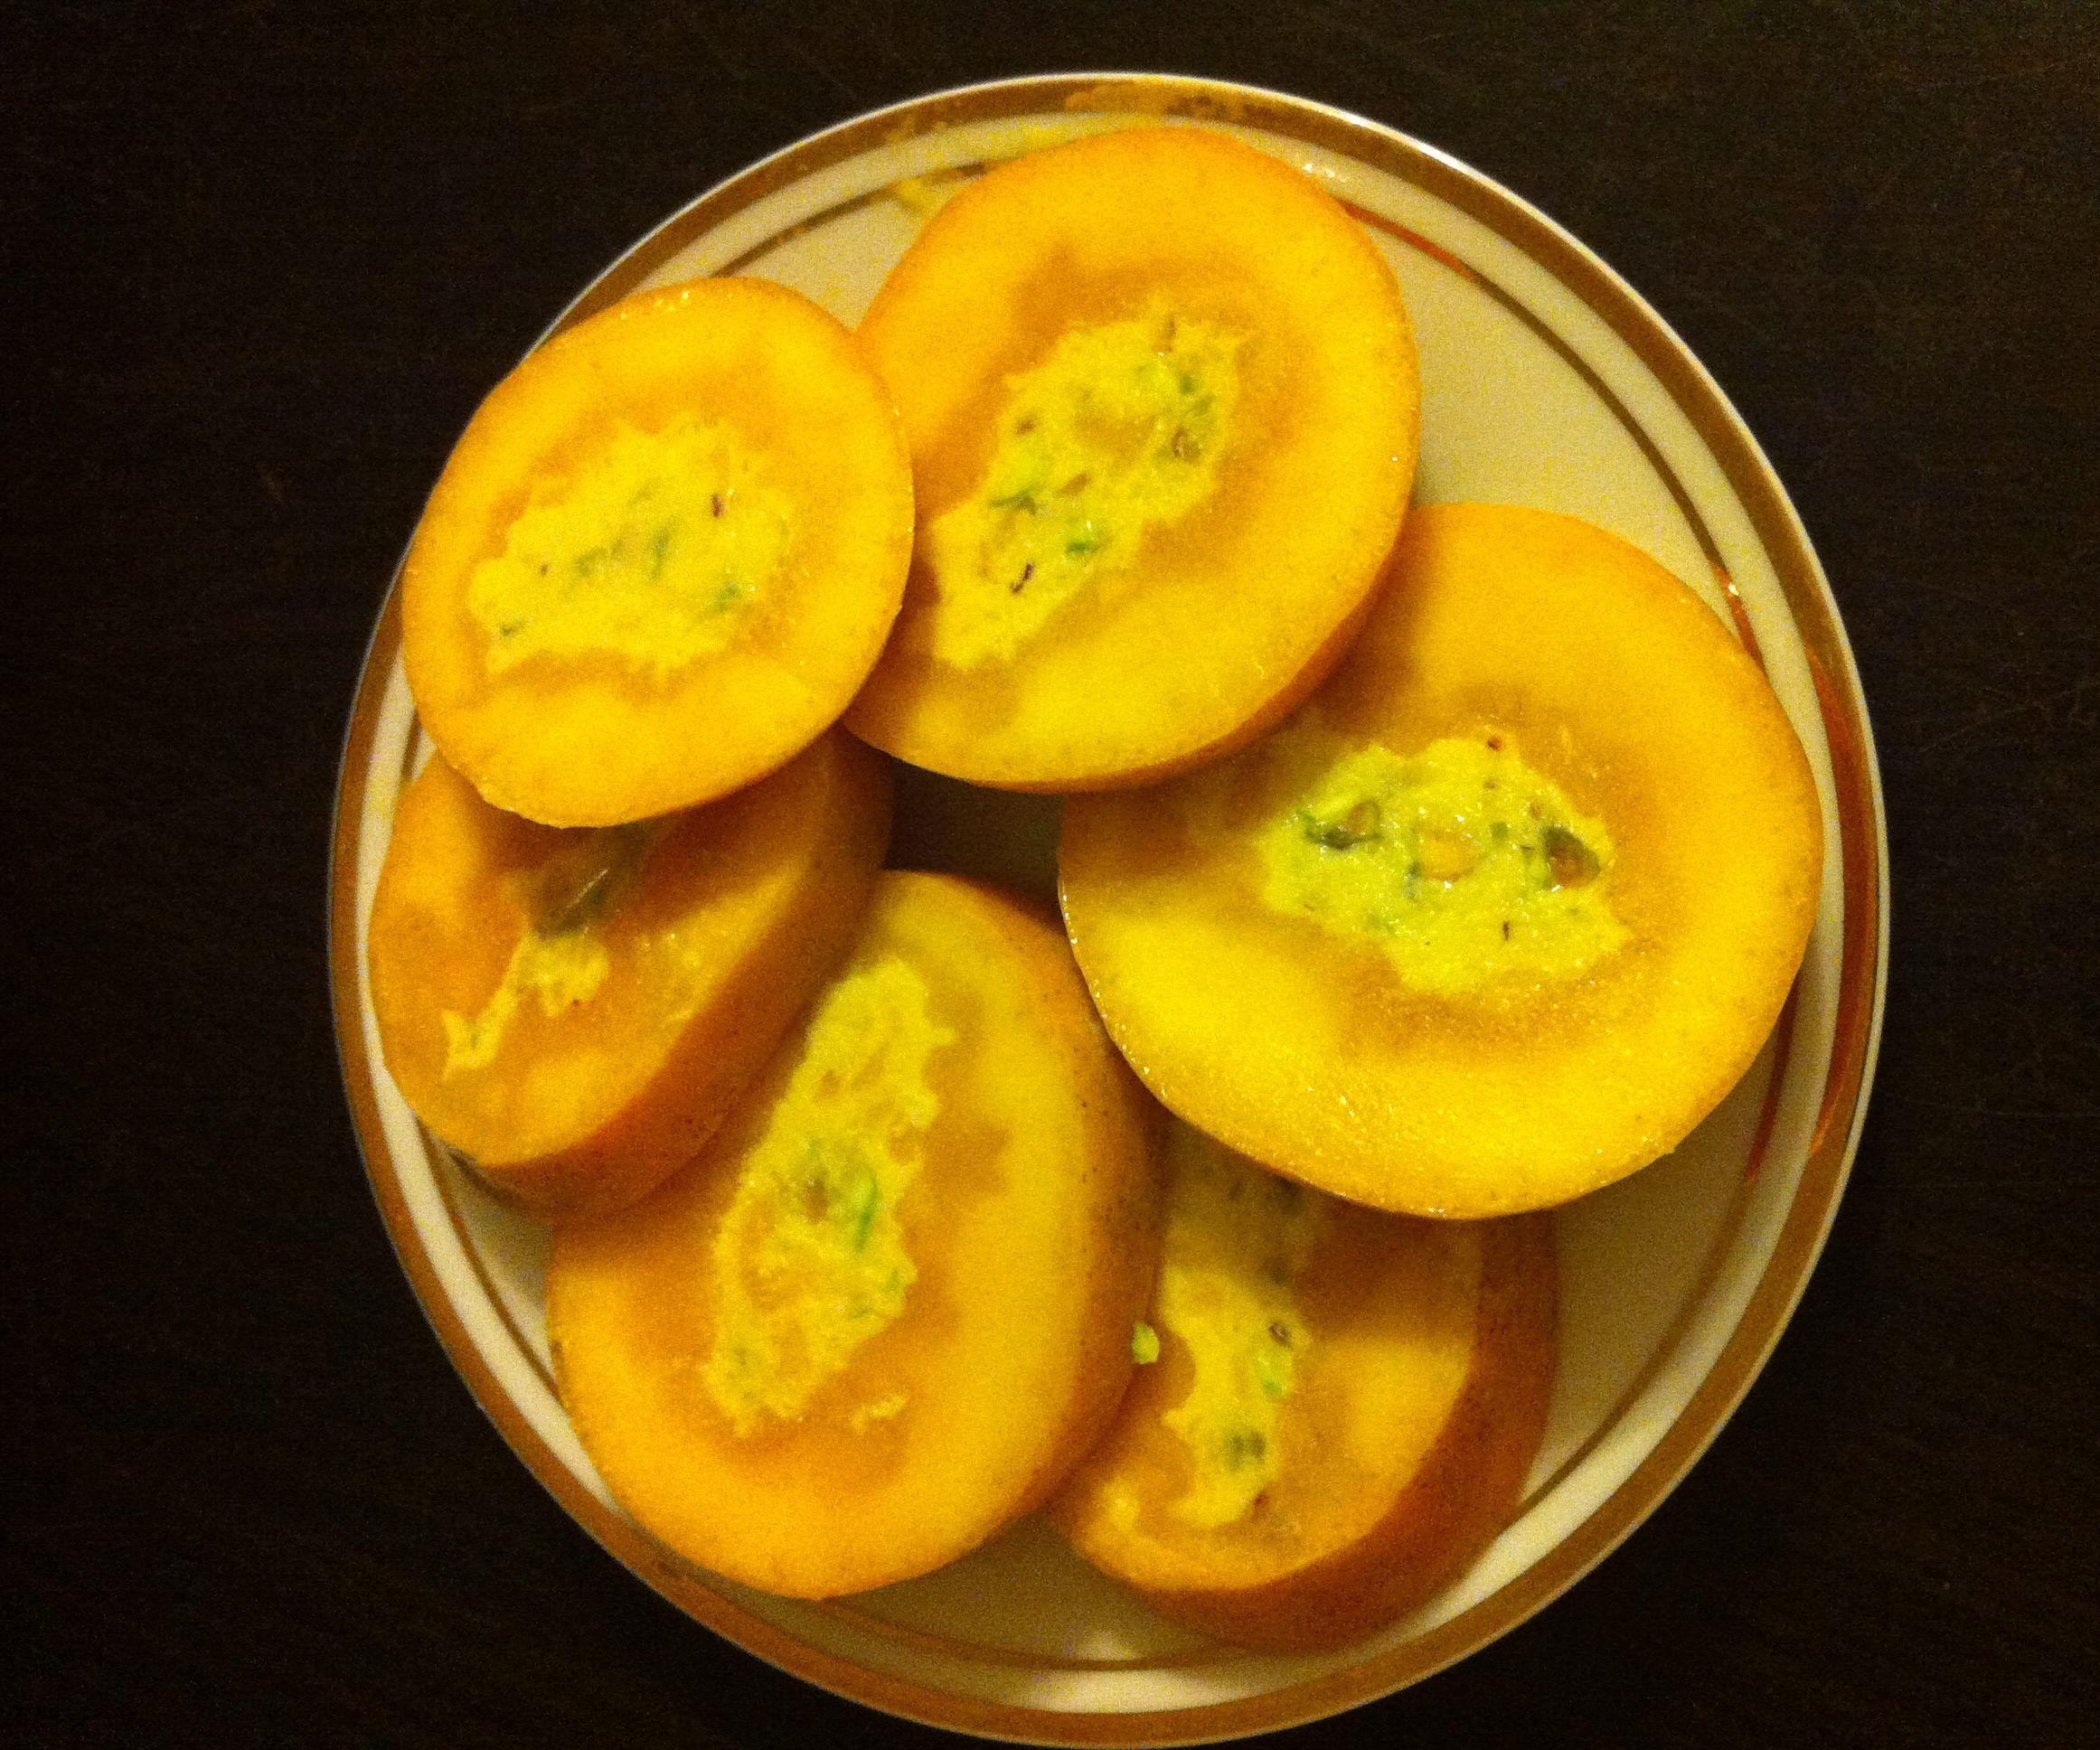 Mango Pistachio Kulfi / Ice cream Inside A Real Mango